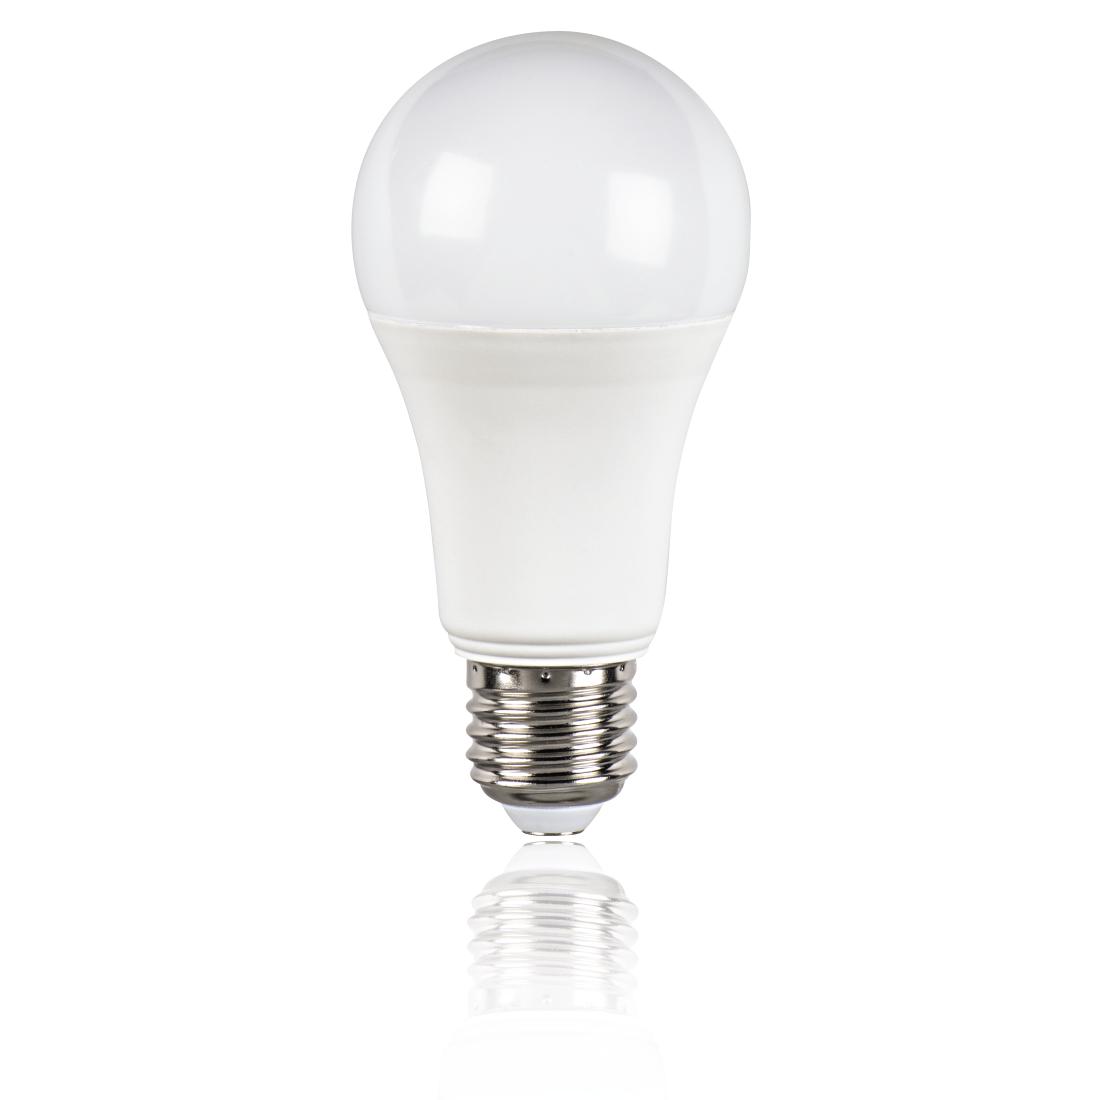 Xavax - Die Starke Marke im Haushalt xavax.eu | 00112500 Xavax LED ...